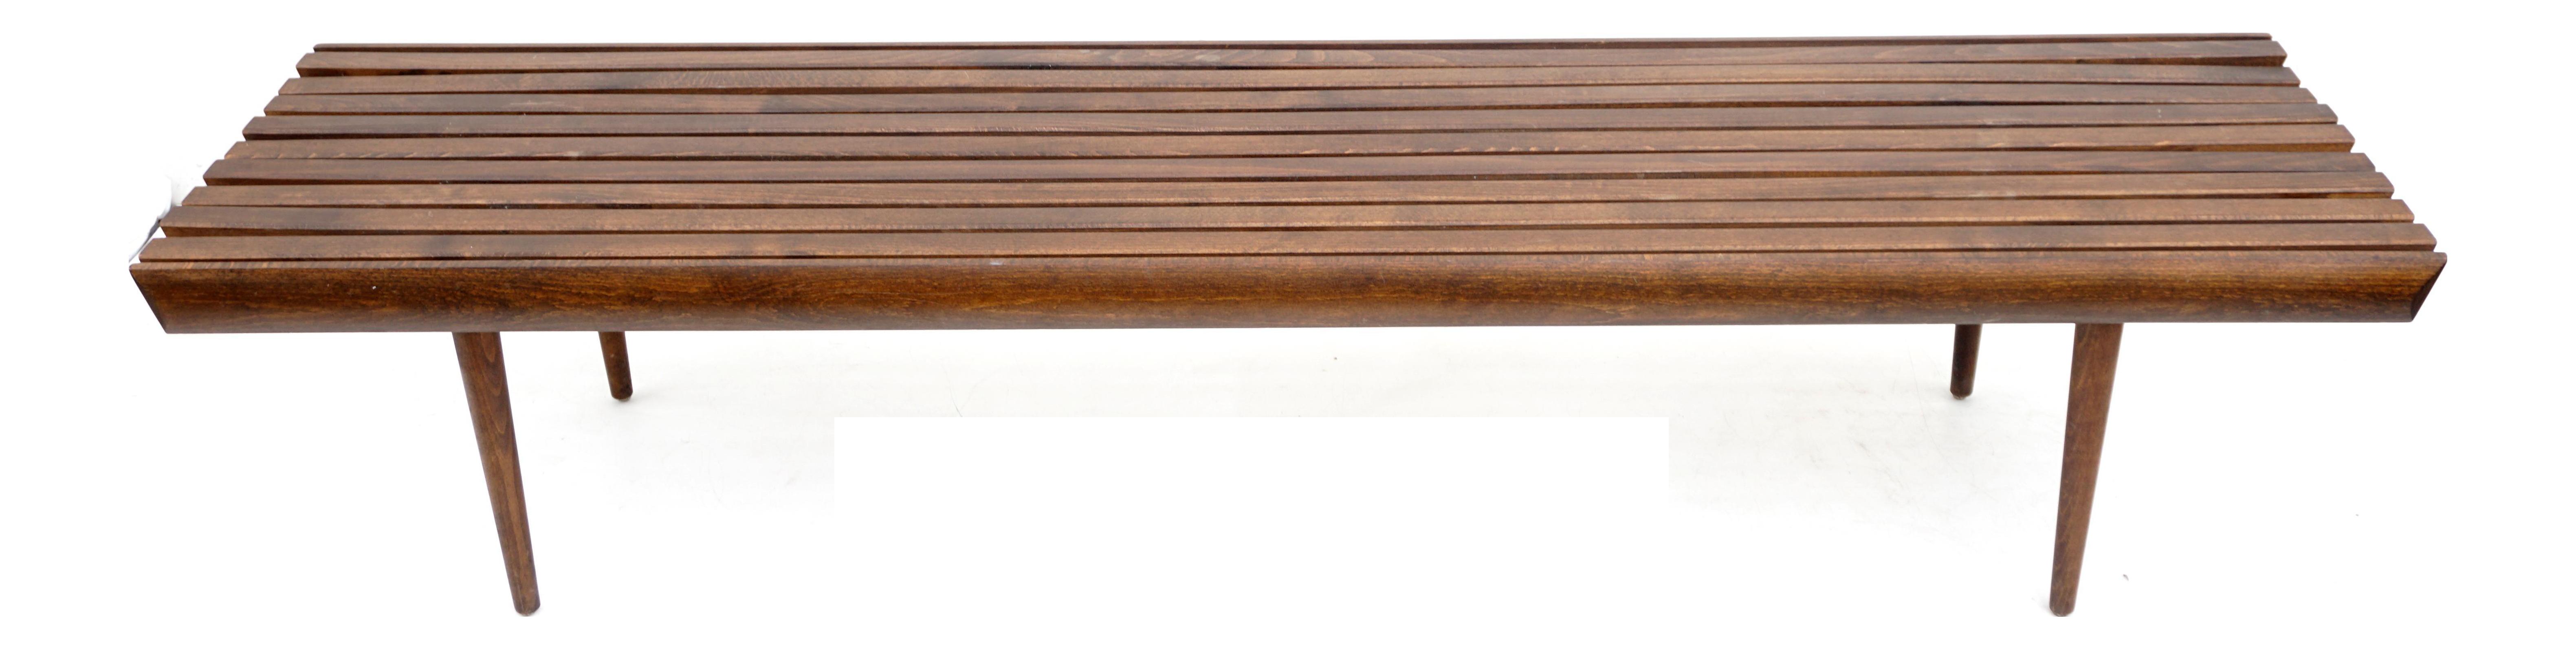 wooden images cedar leopard finish wood shoe solid stunning on skin storage white chest shelf upholstered bench end long back with living room for bedroom baskets black